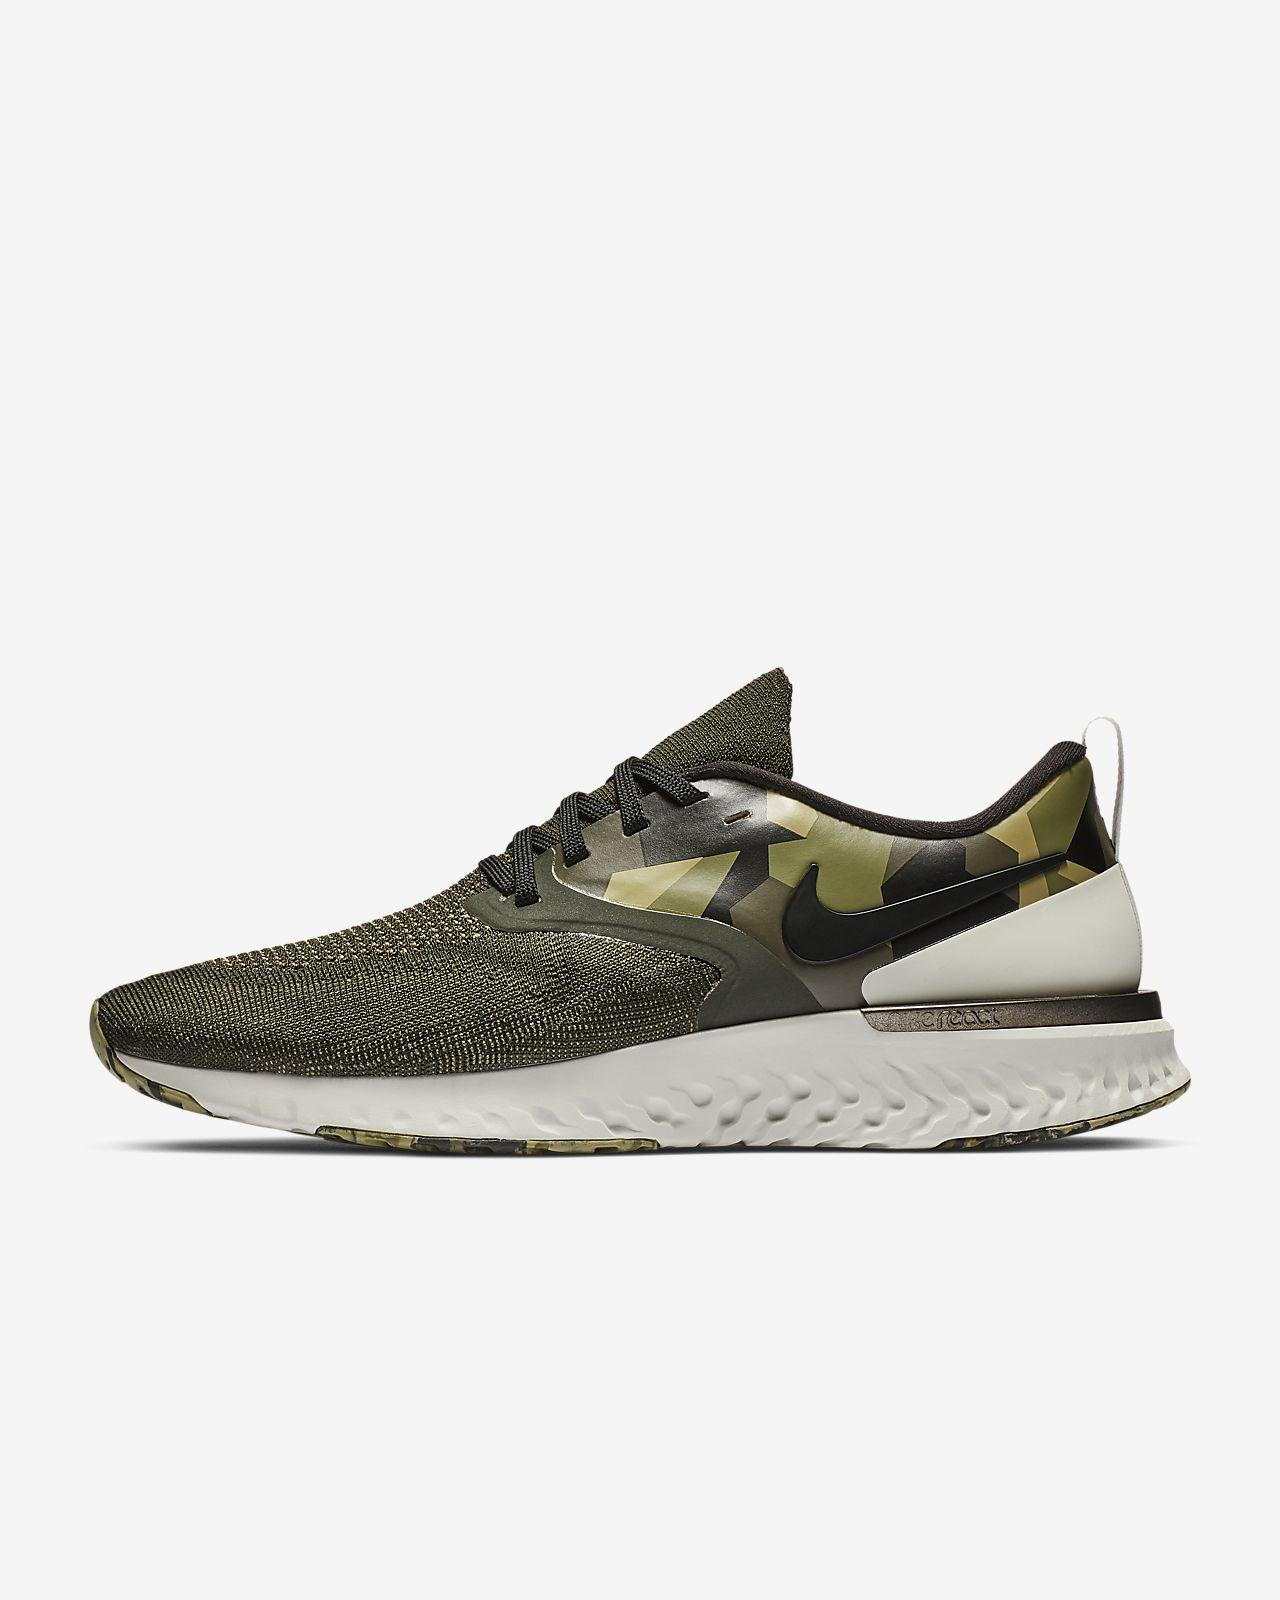 Nike Odyssey React Flyknit 2 Zapatillas de running con estampado - Hombre